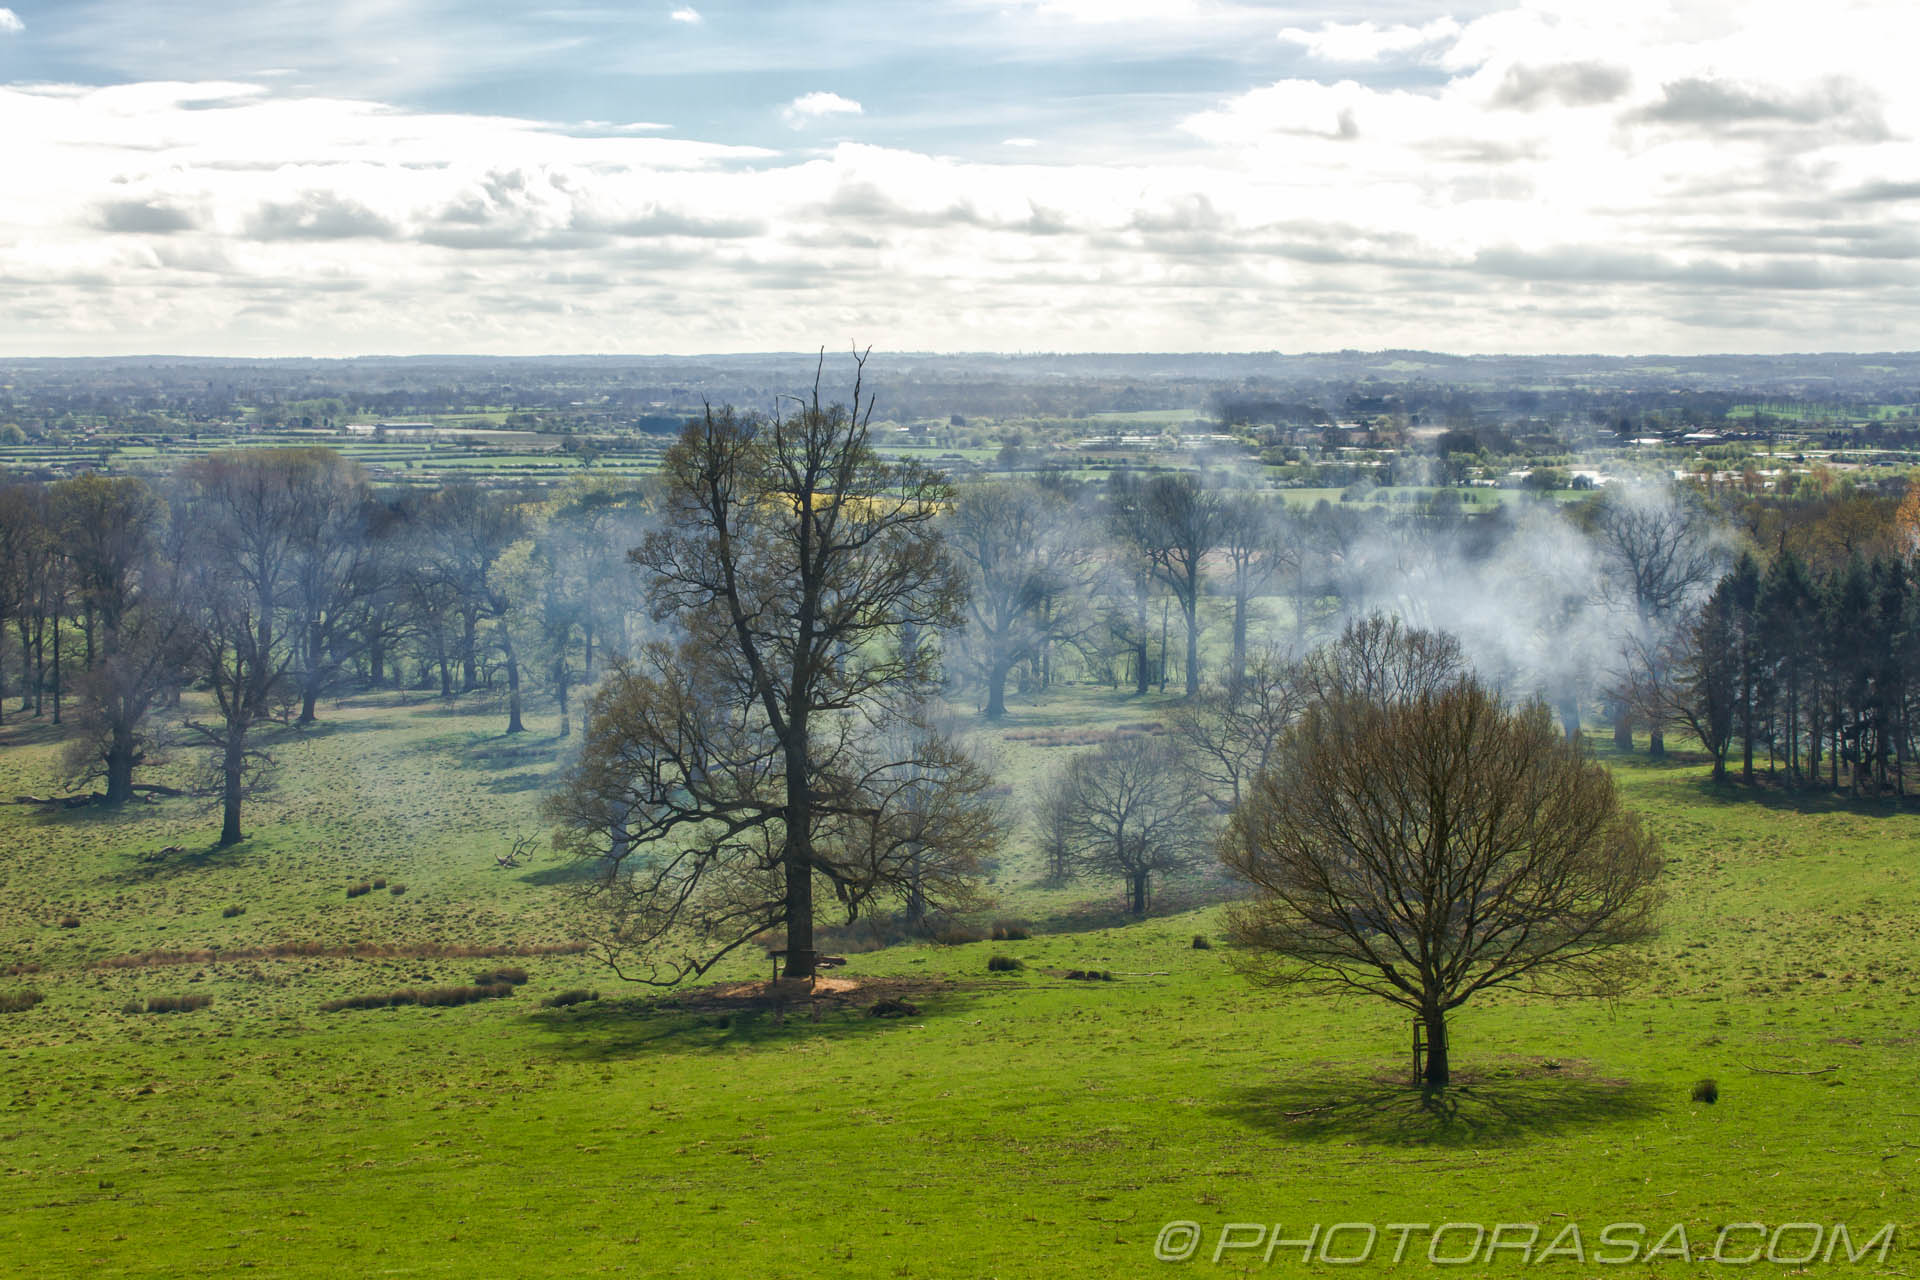 https://photorasa.com/view-boughton-monchelsea-churchyard/smoke-across-the-deer-park/